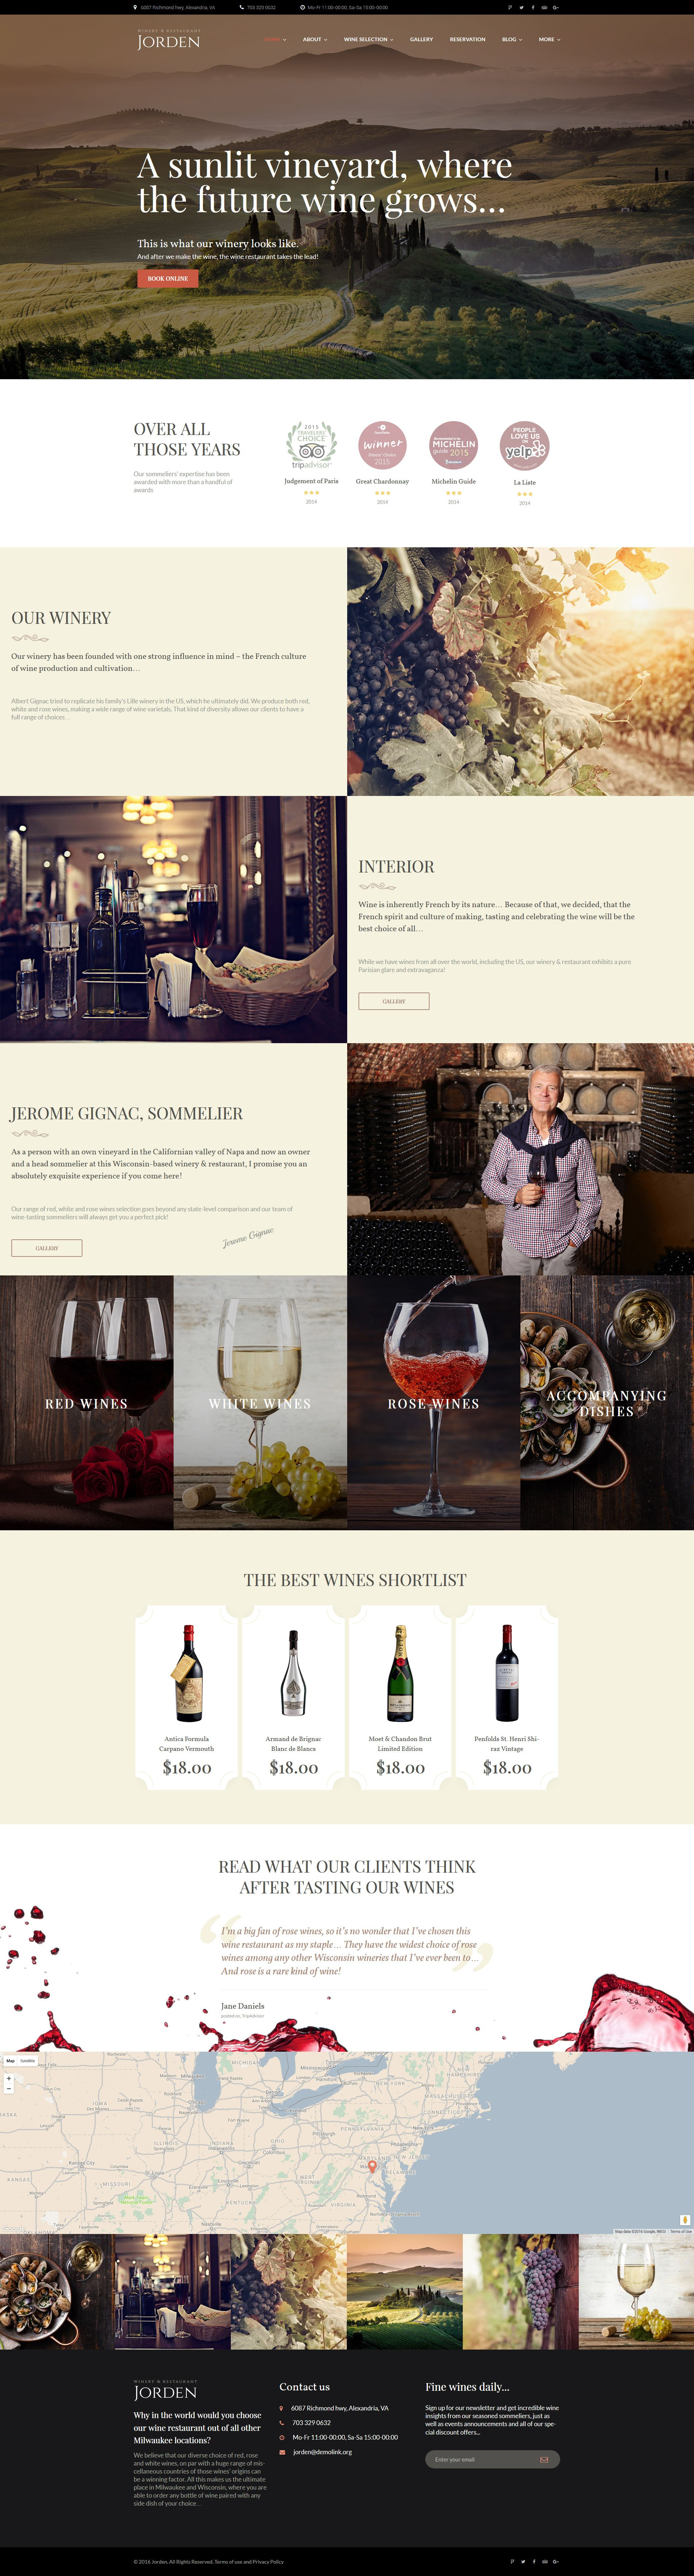 """Jorden - Vin & Vignoble"" thème WordPress adaptatif #58992"